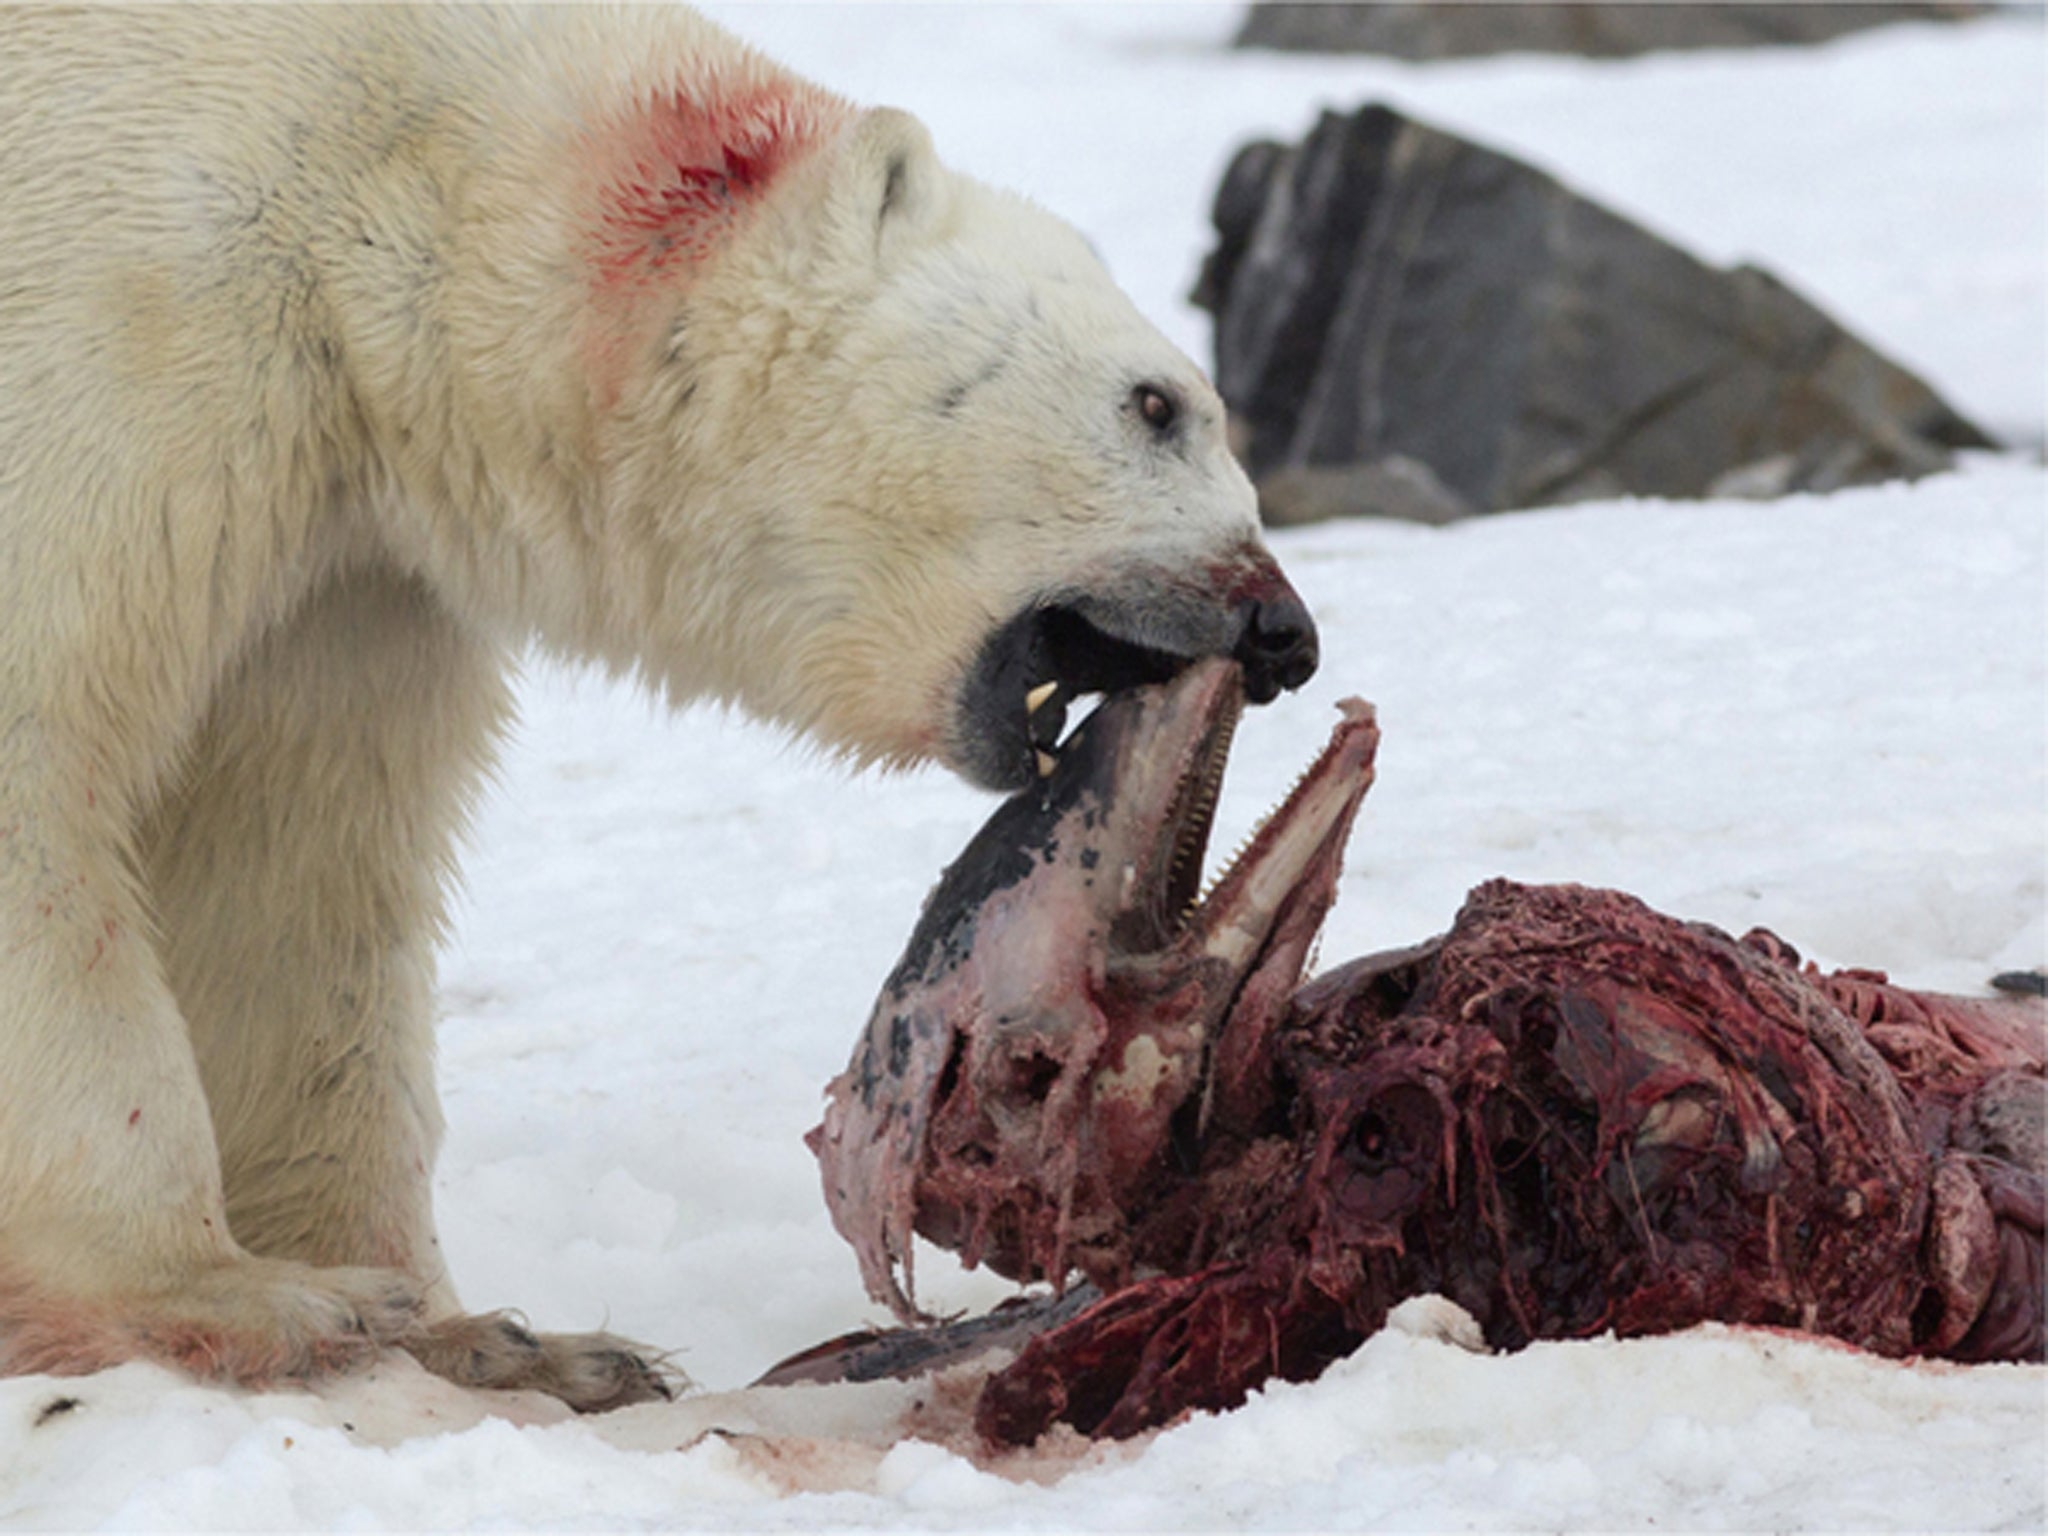 Bear ravaged by straighty